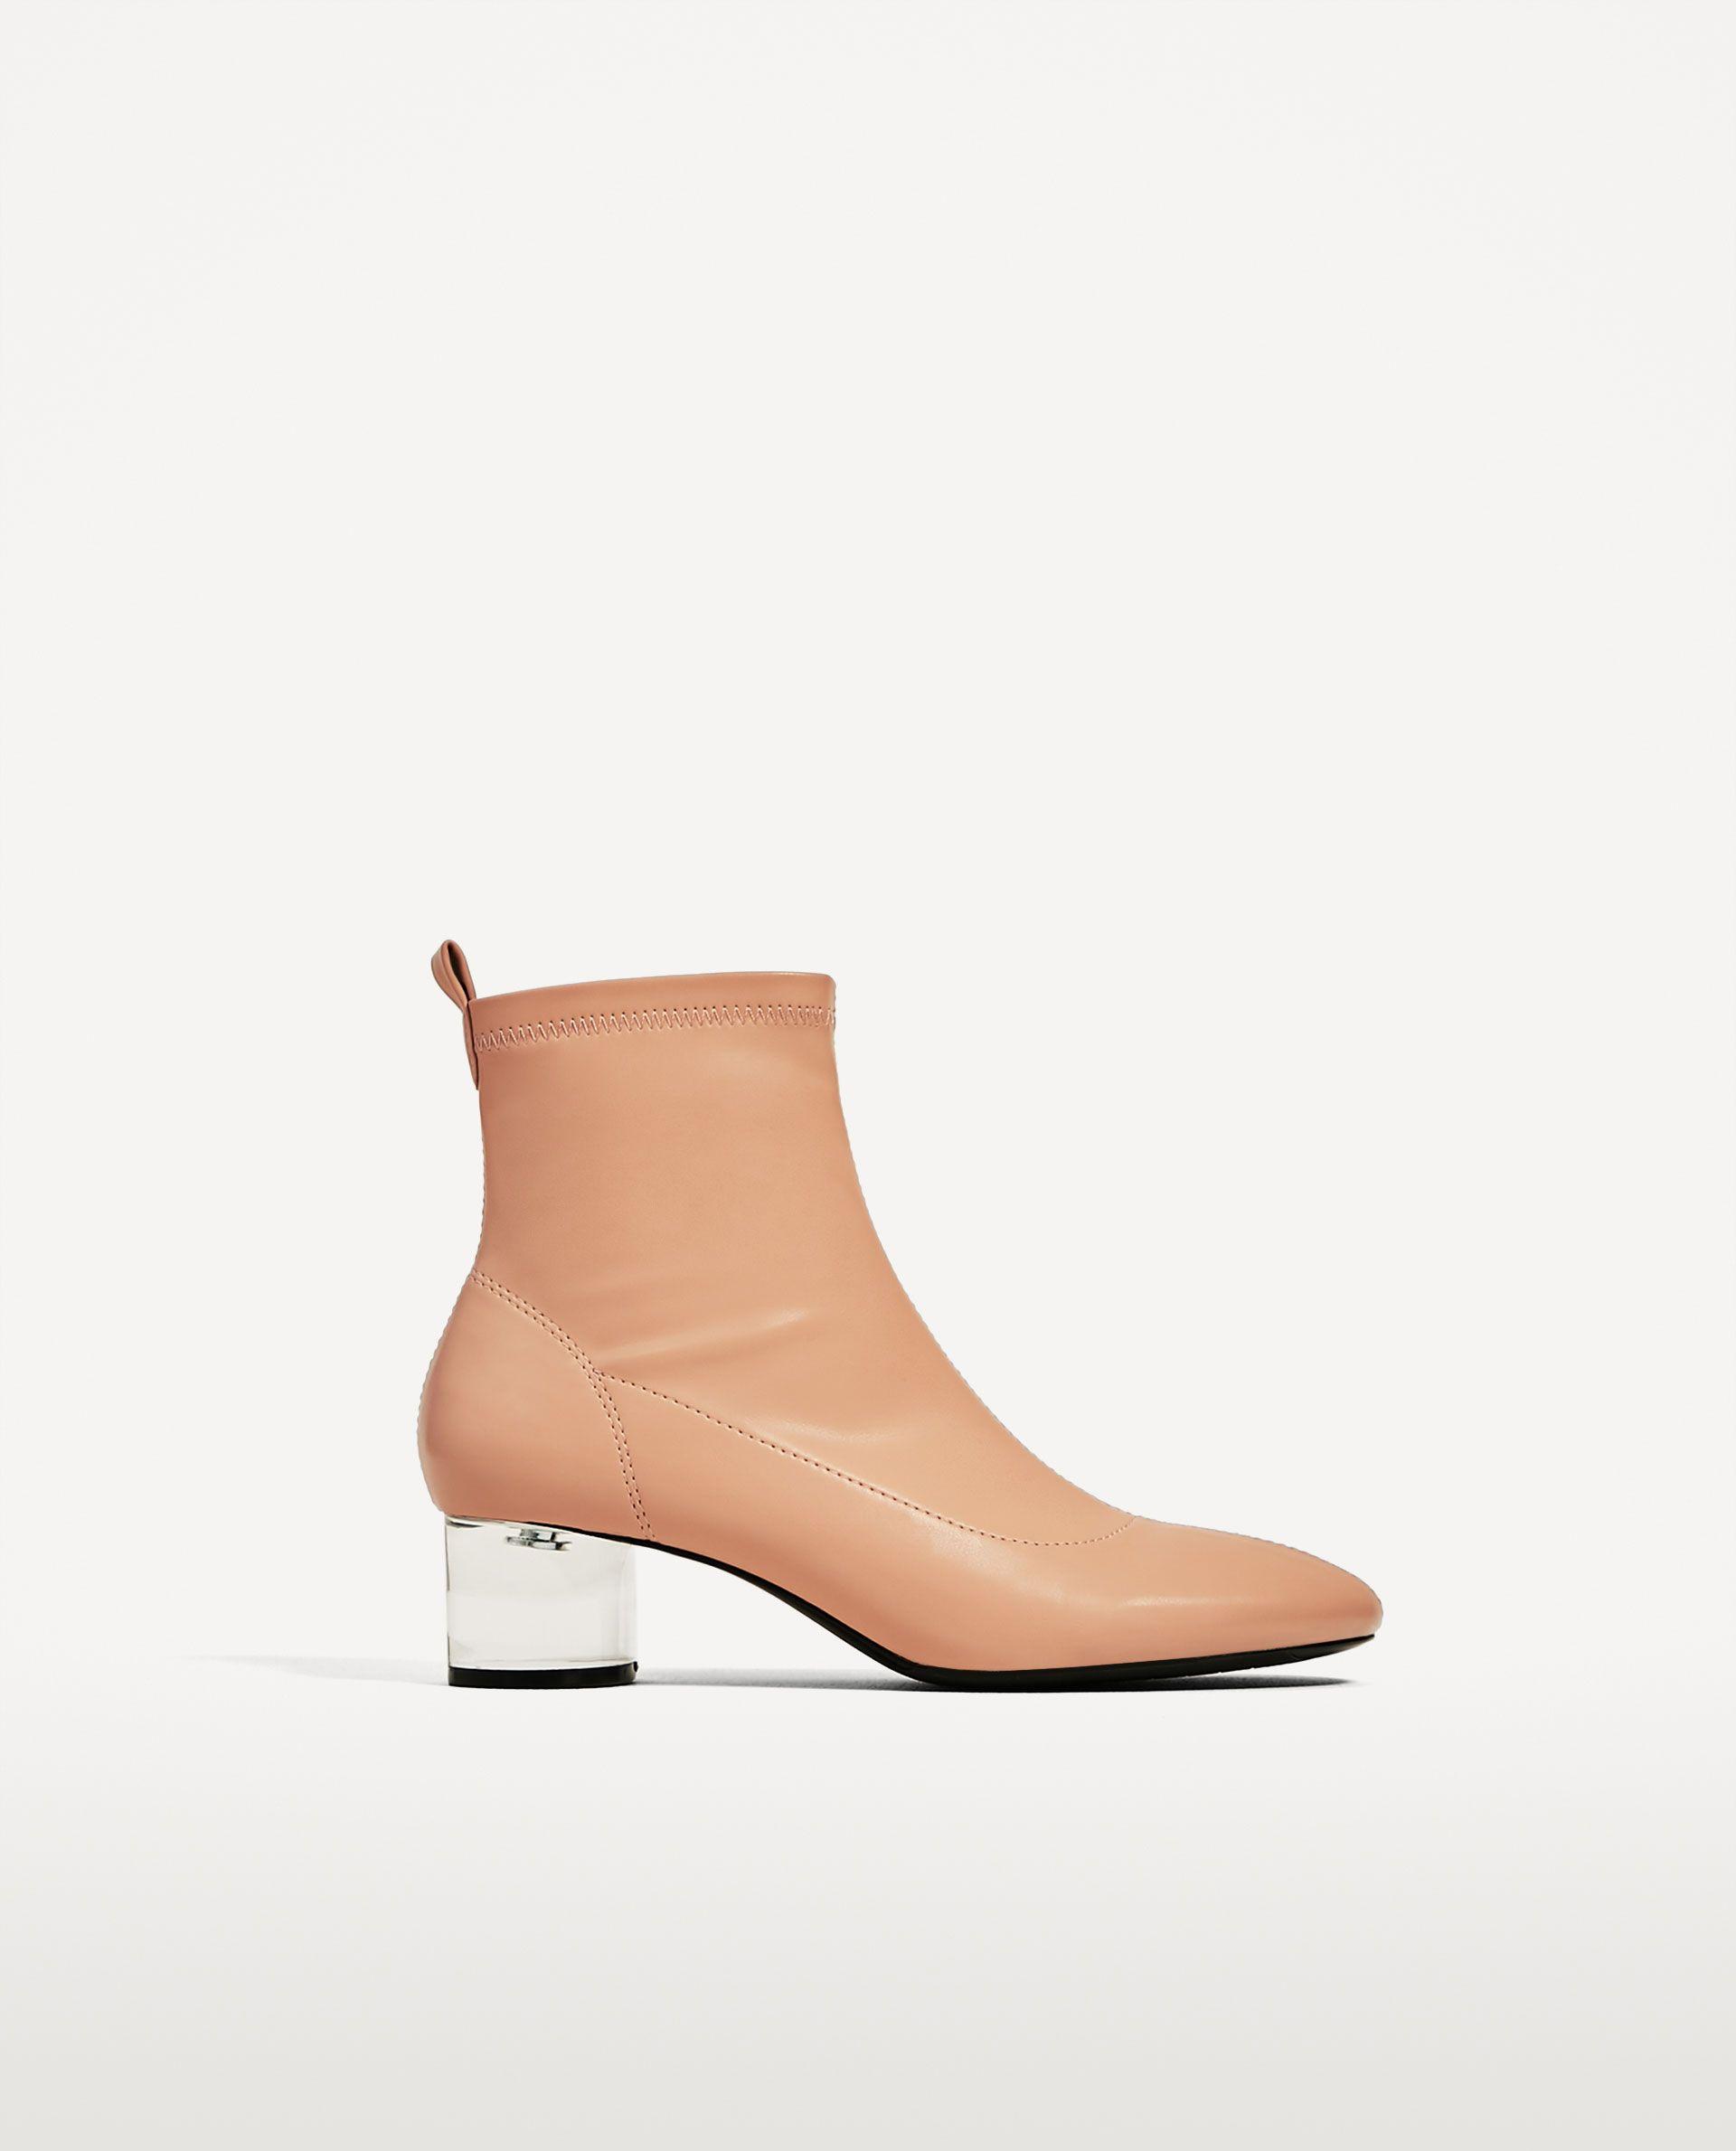 9877a74d376 zara nude transparent heel boots